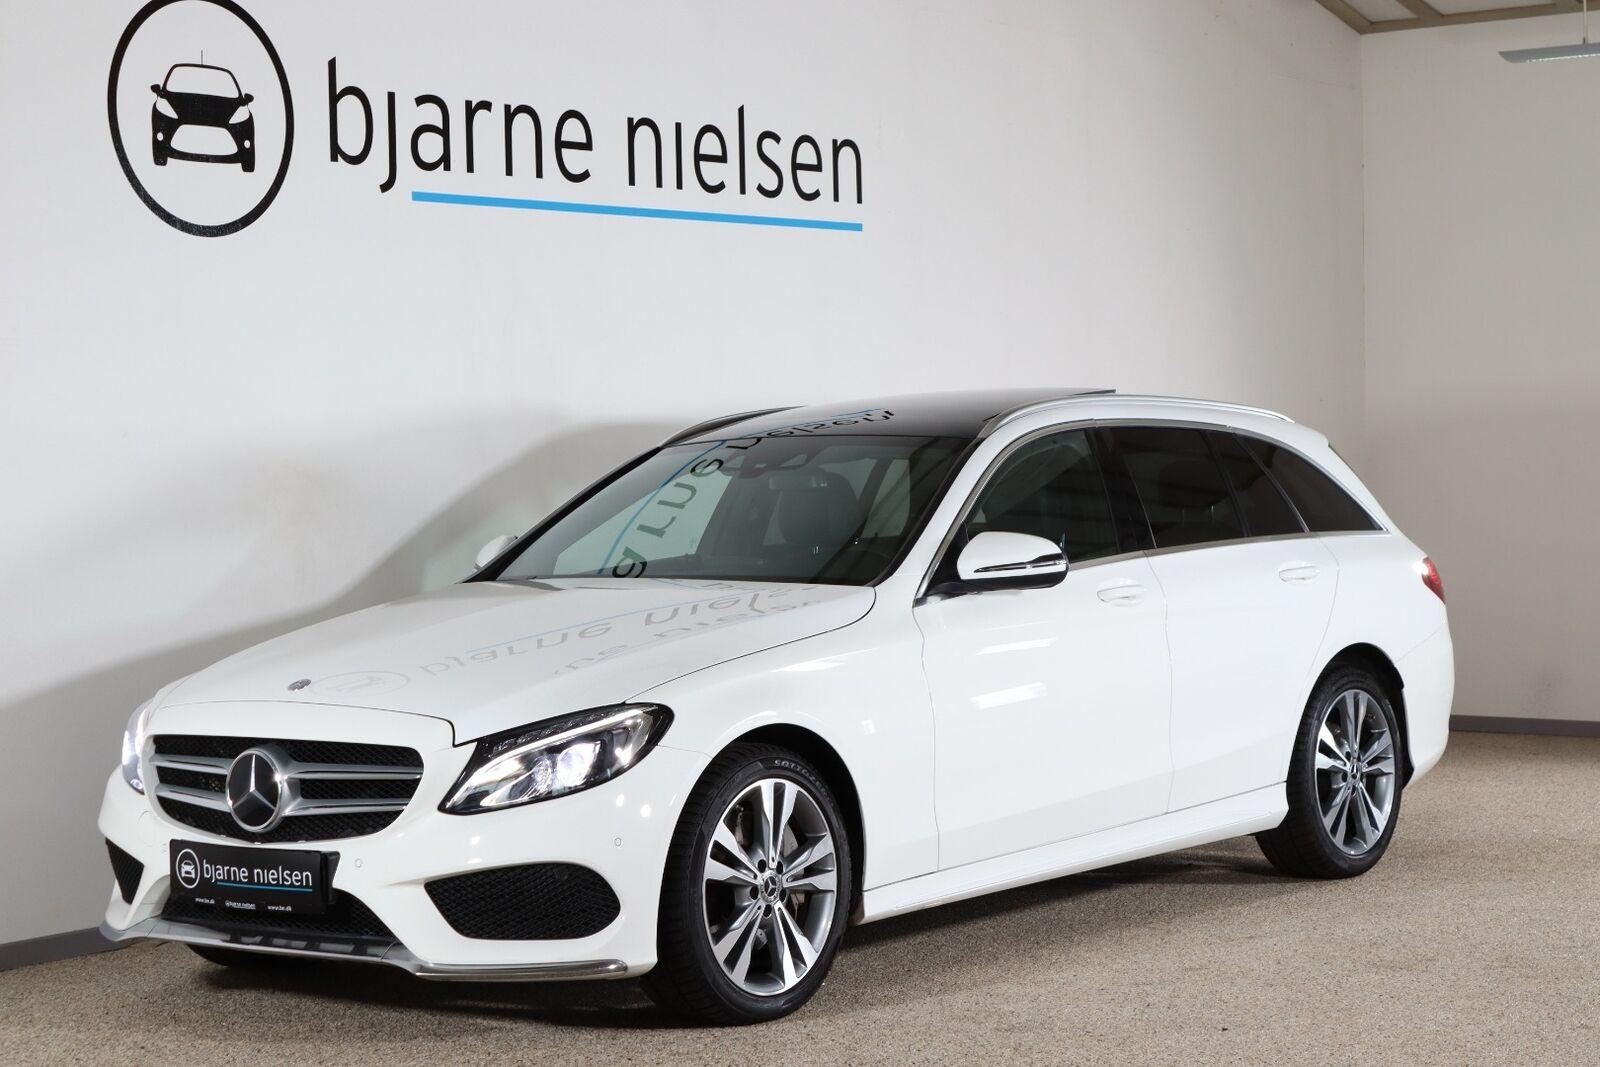 Mercedes C250 d Billede 0